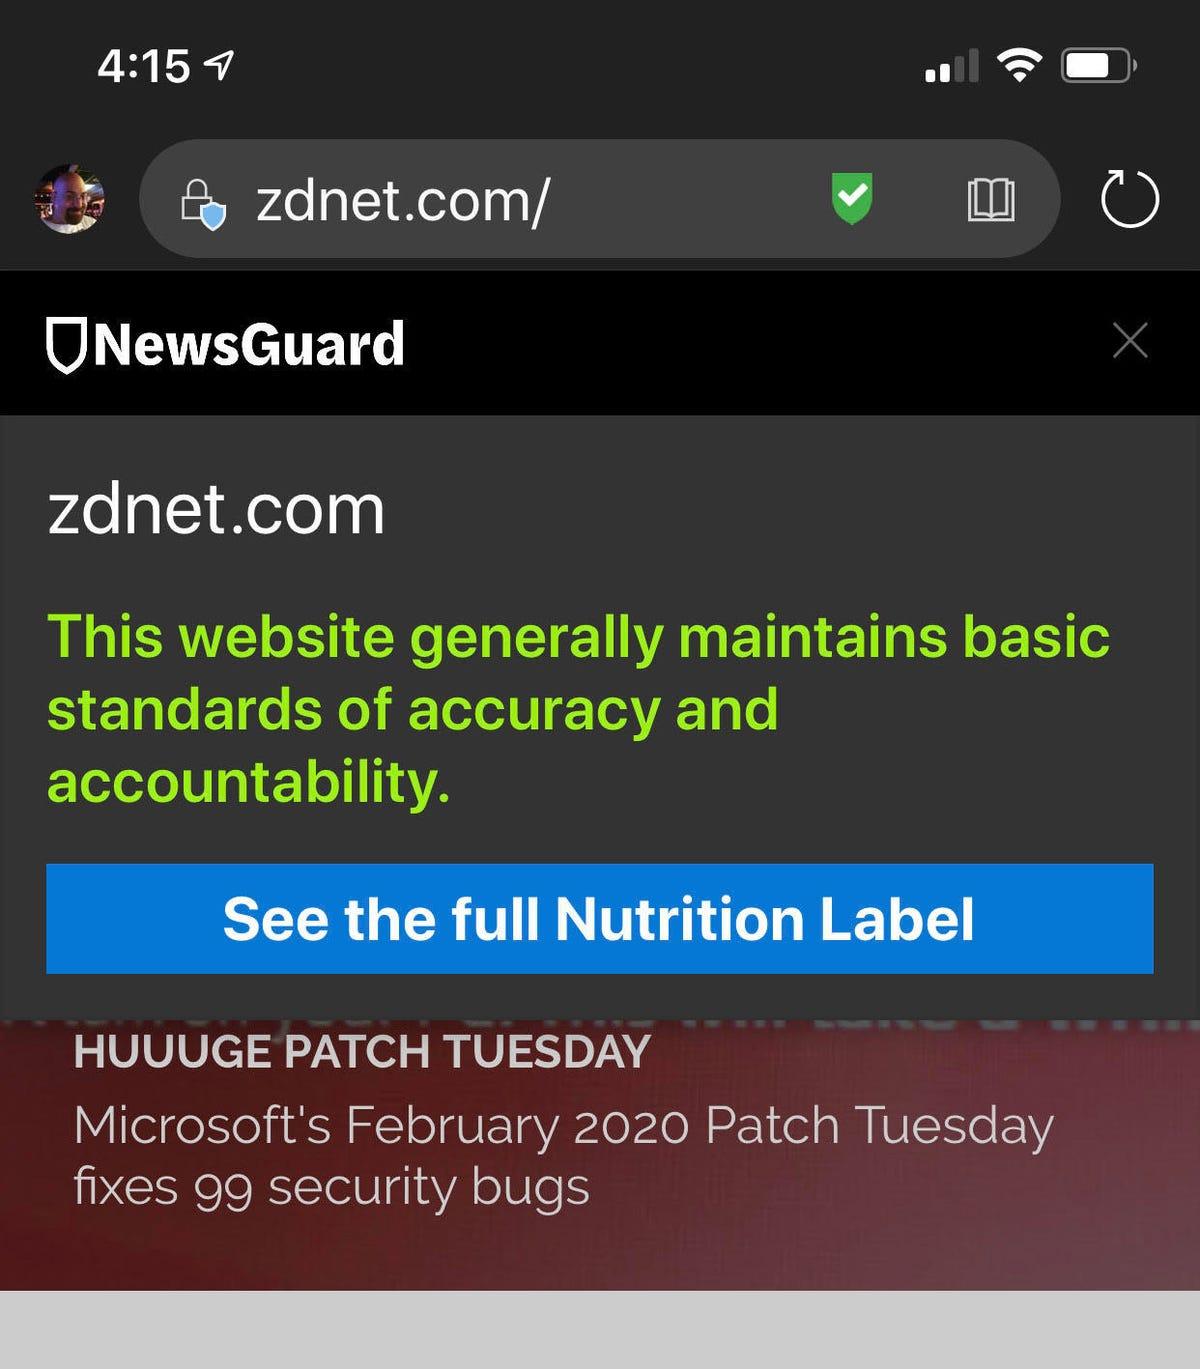 newsguard-edge-zdnet.jpg